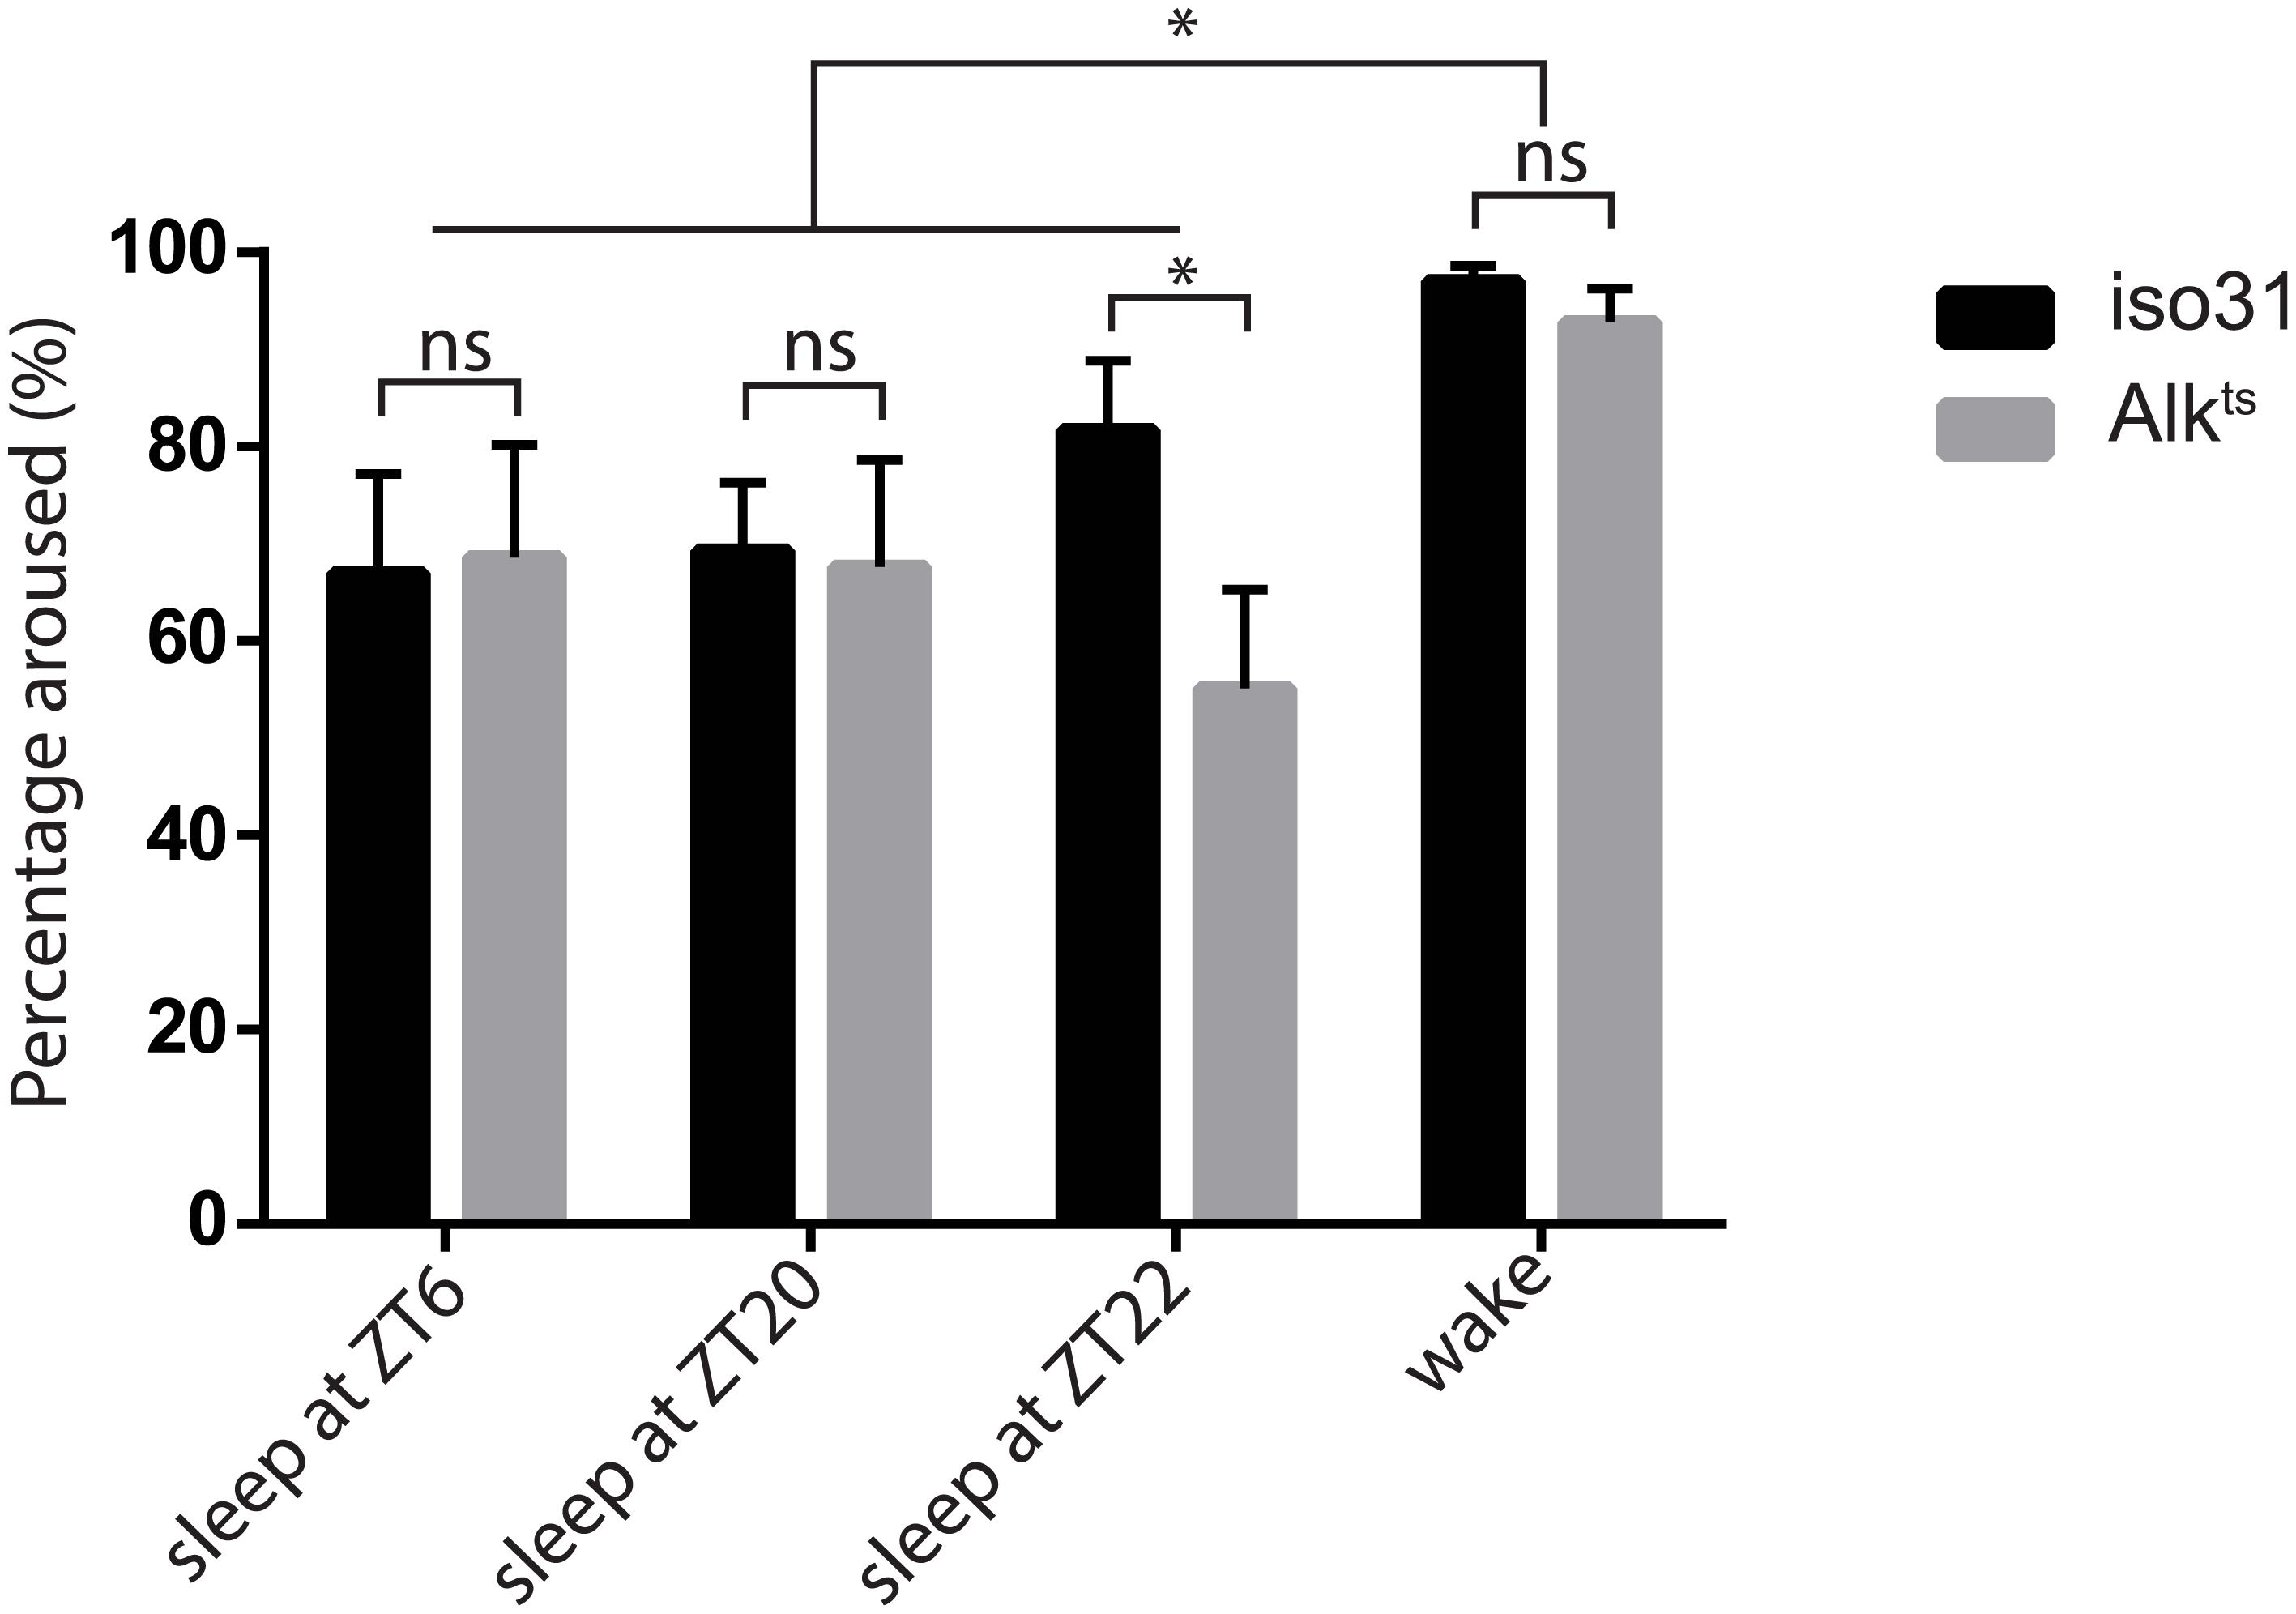 Inactivity of <i>Alk</i><sup><i>ts</i></sup> mutants is due to a prolonged sleep state.